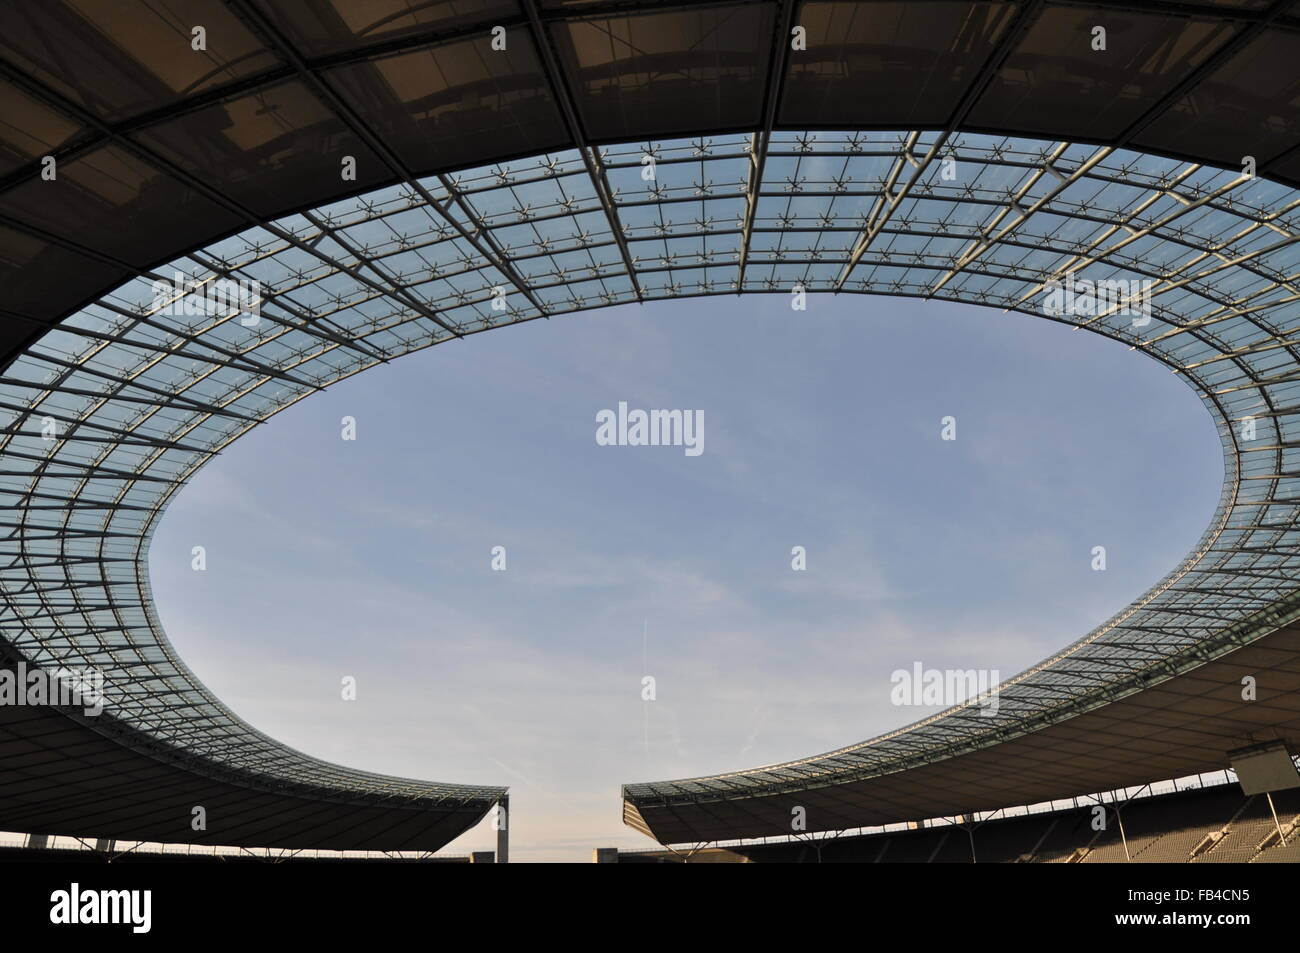 Berlin, Olympia Stadion - Stock Image